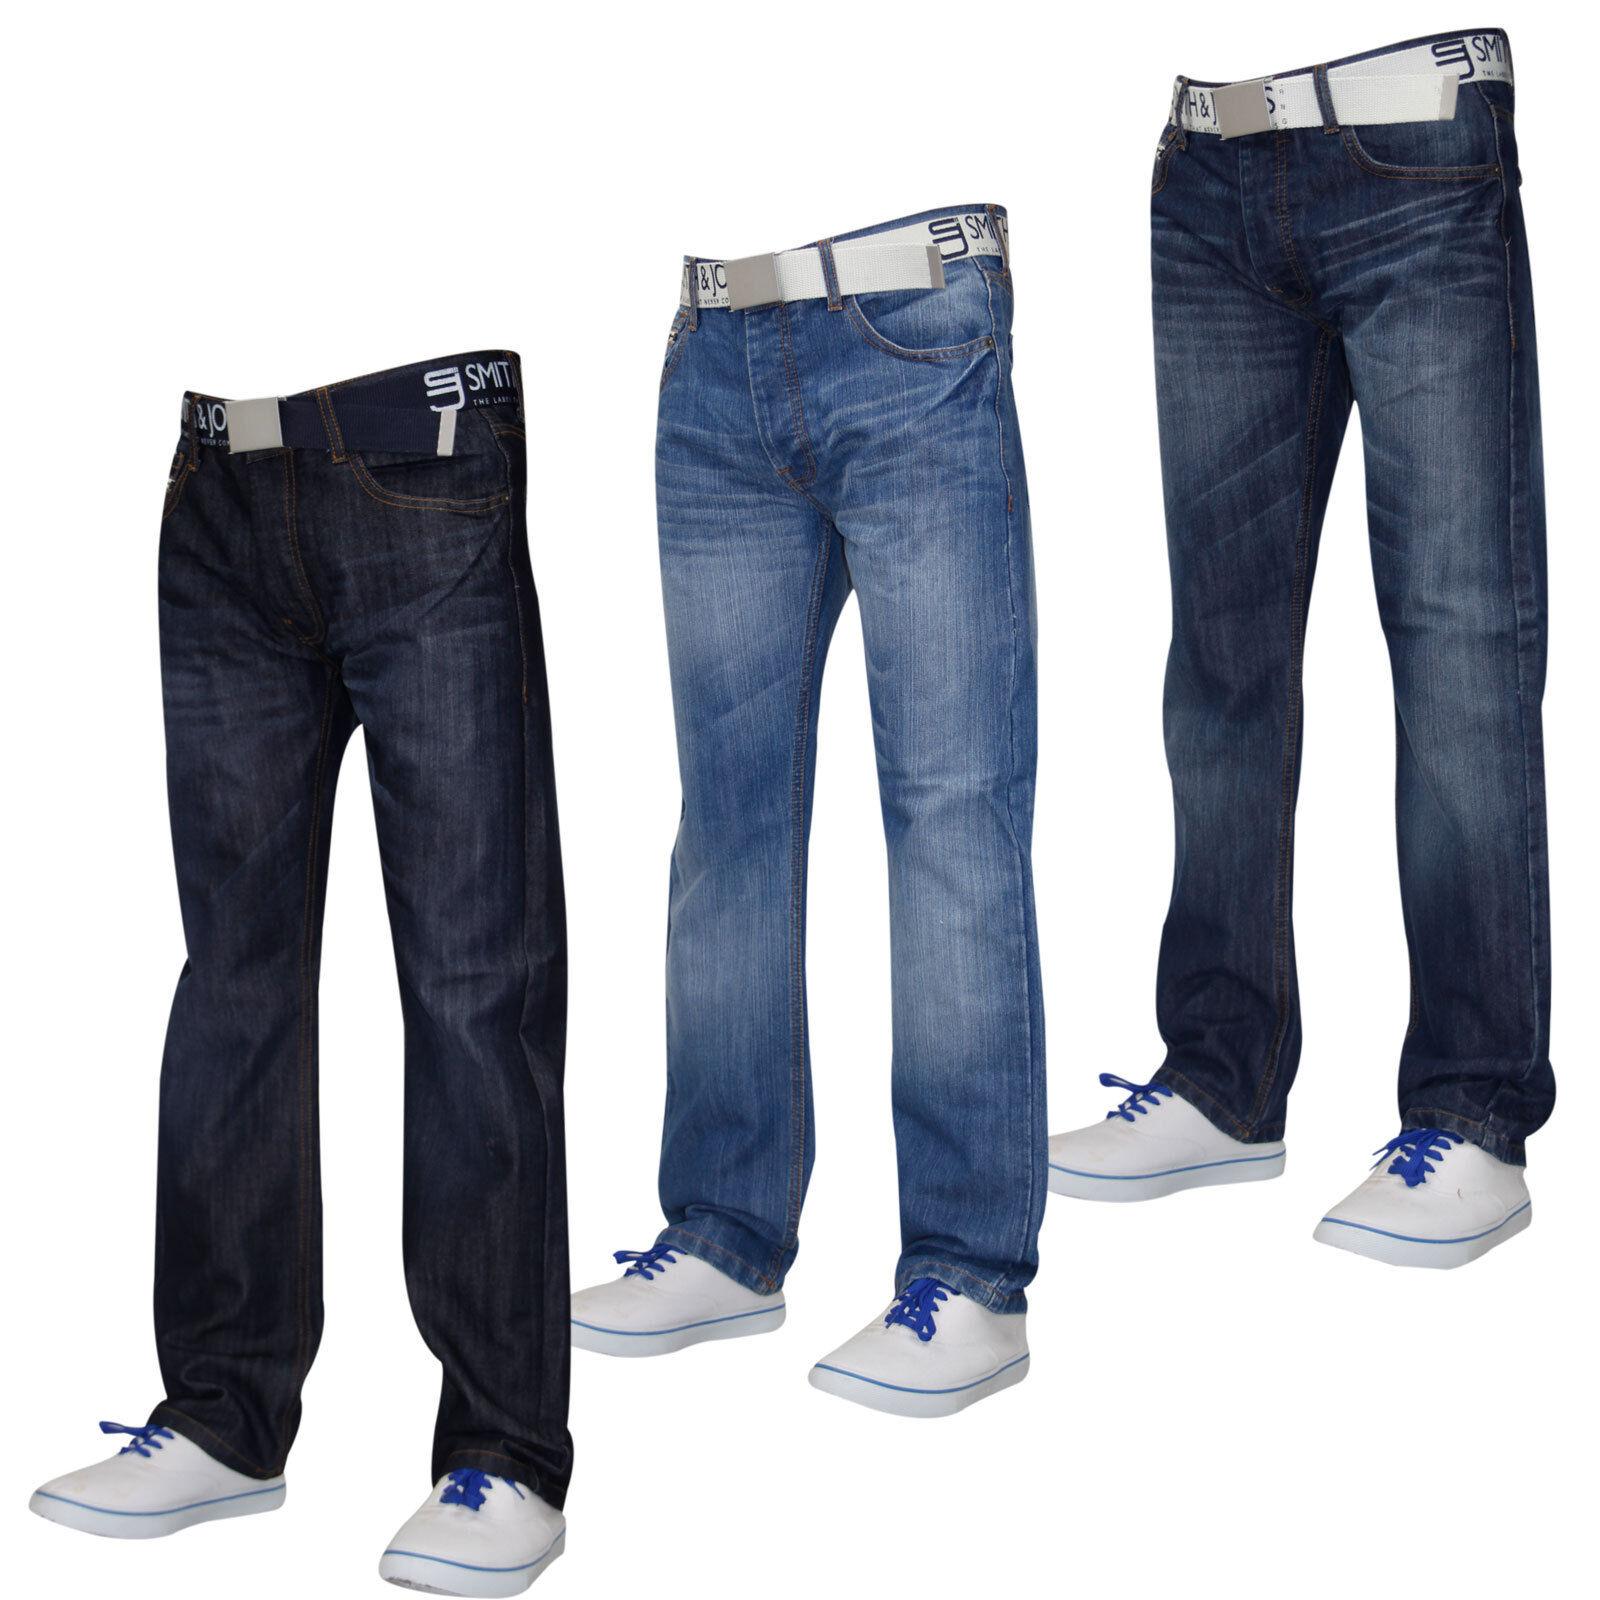 Herren Designer Smith & Jones Jeans Gratis Gürtel Denim Denim Denim Furio Straight Cut Hose     Neuer Markt  5222f7